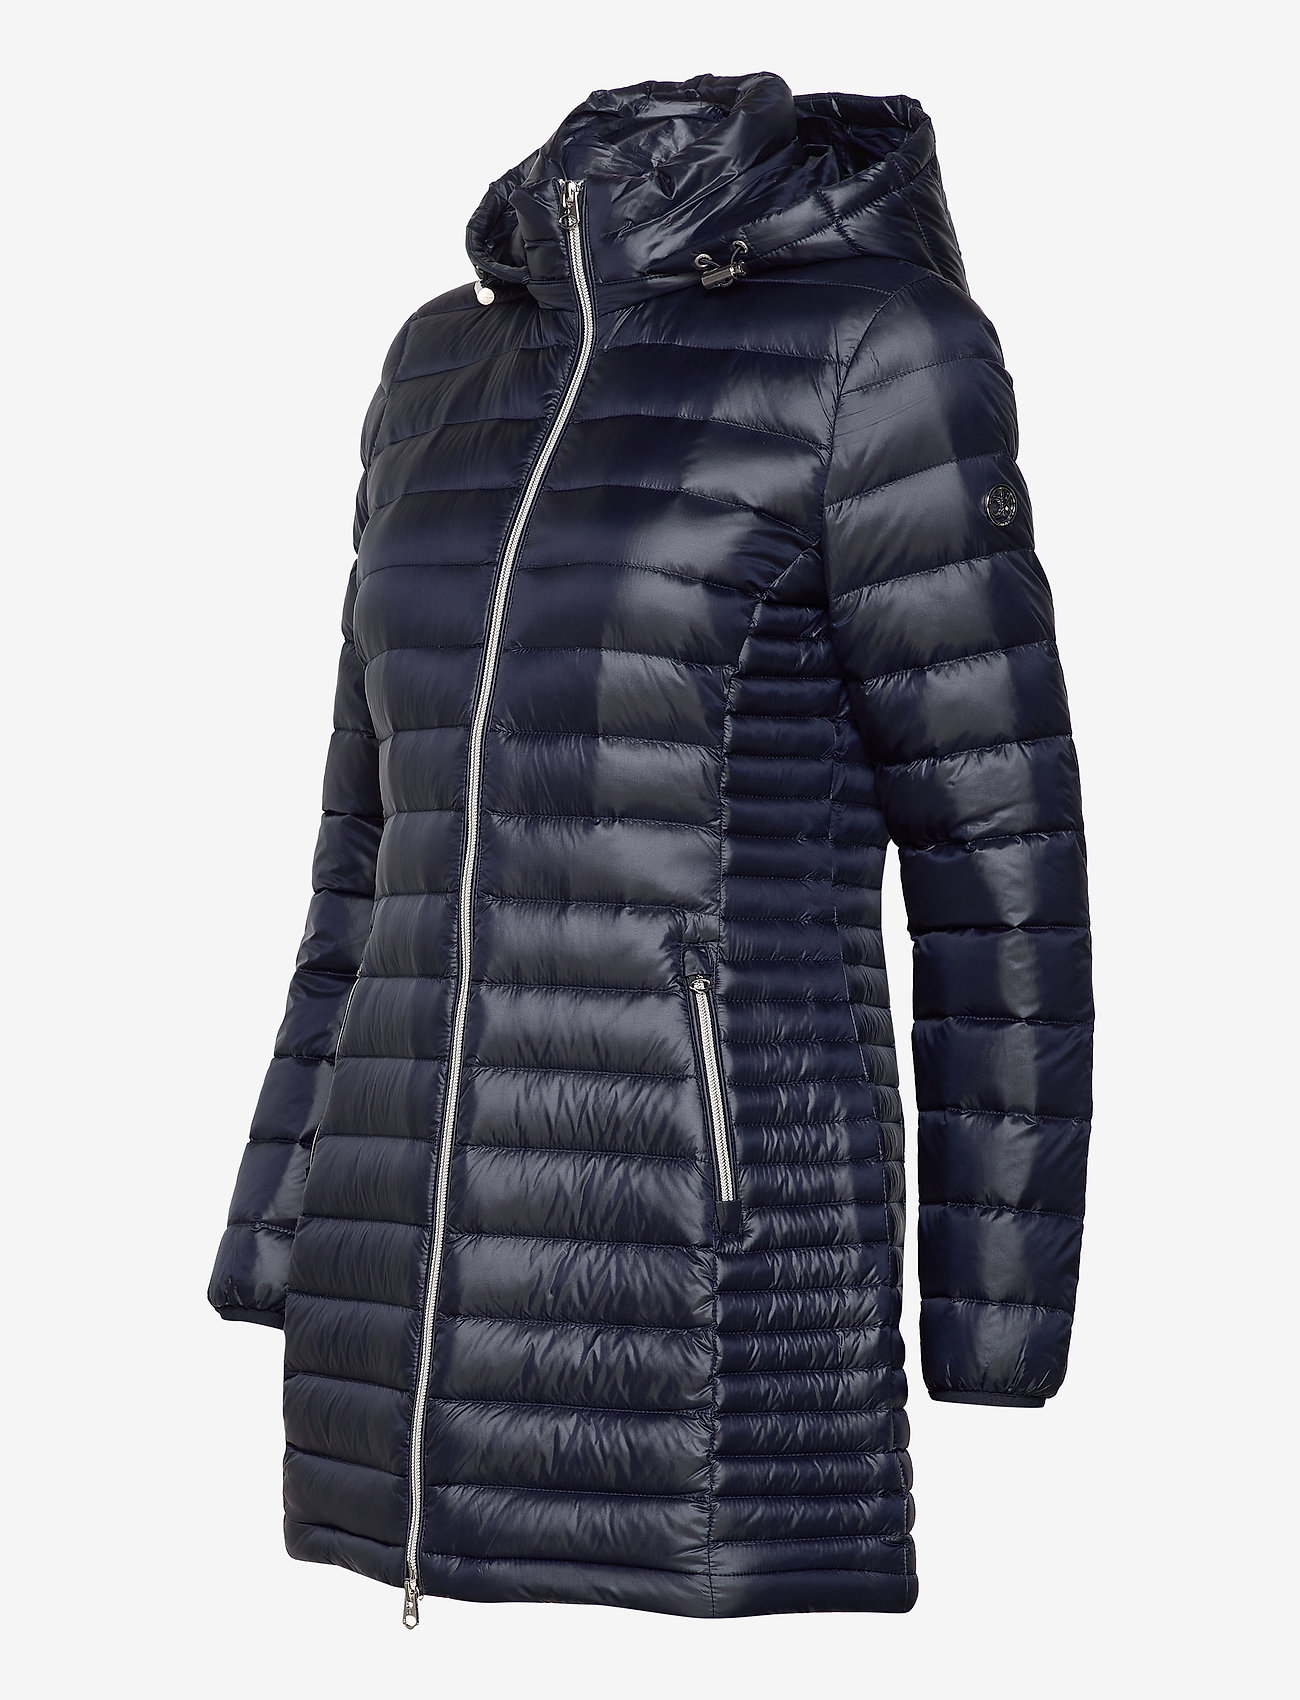 Essential Lt Down Coat (Calvin Navy) (2800 kr) - Calvin Klein